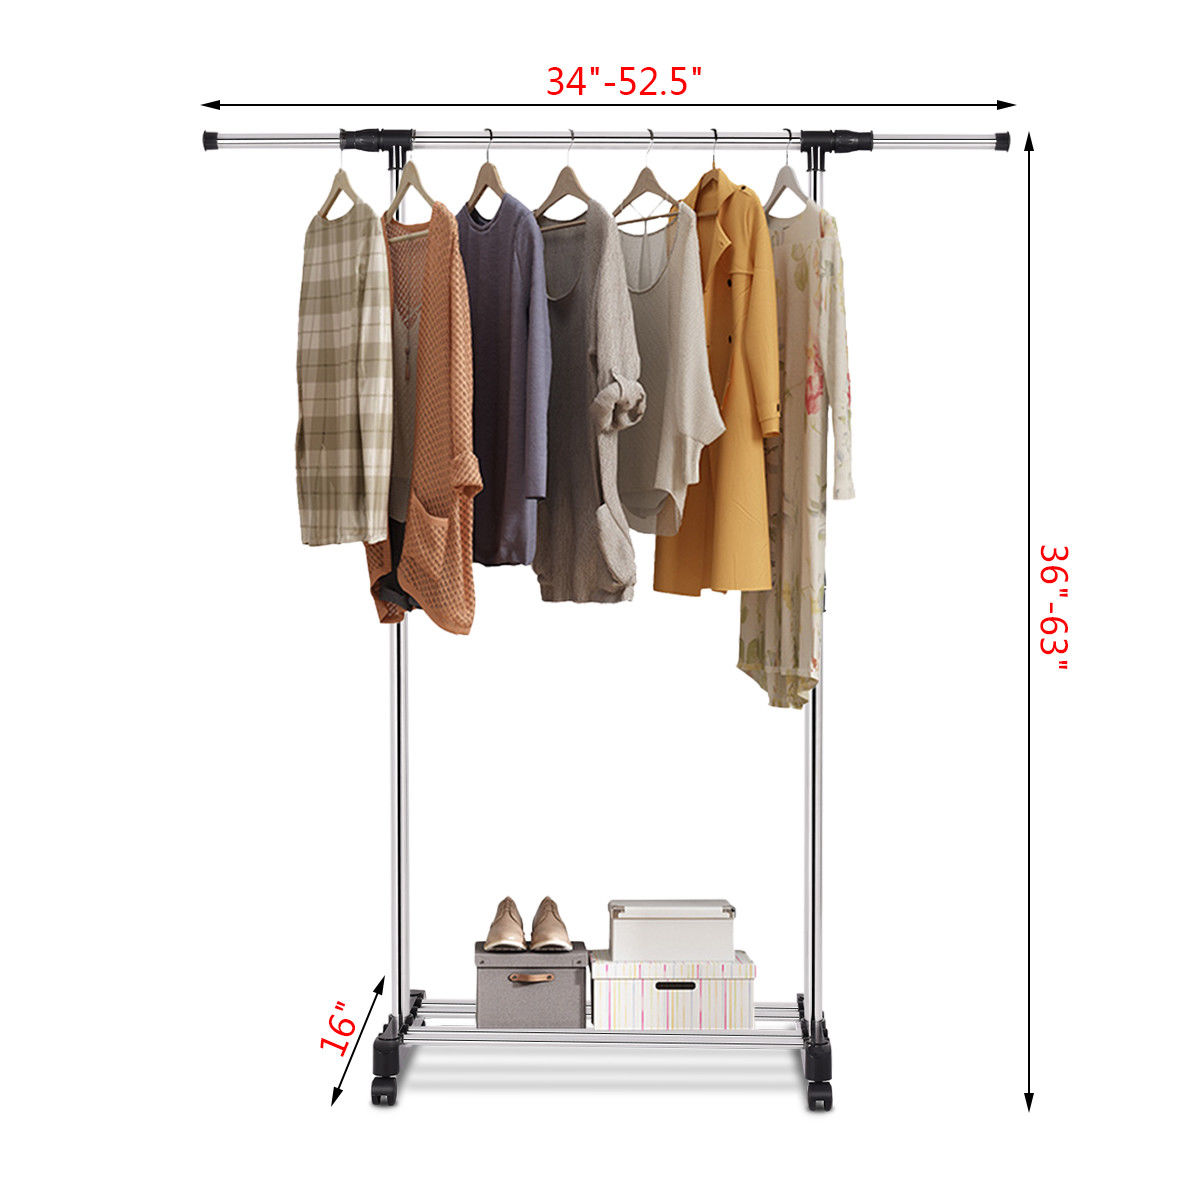 36-in W Garment Rack Closet Shelf Organizer Hanger Clothes Heavy Duty Rolling